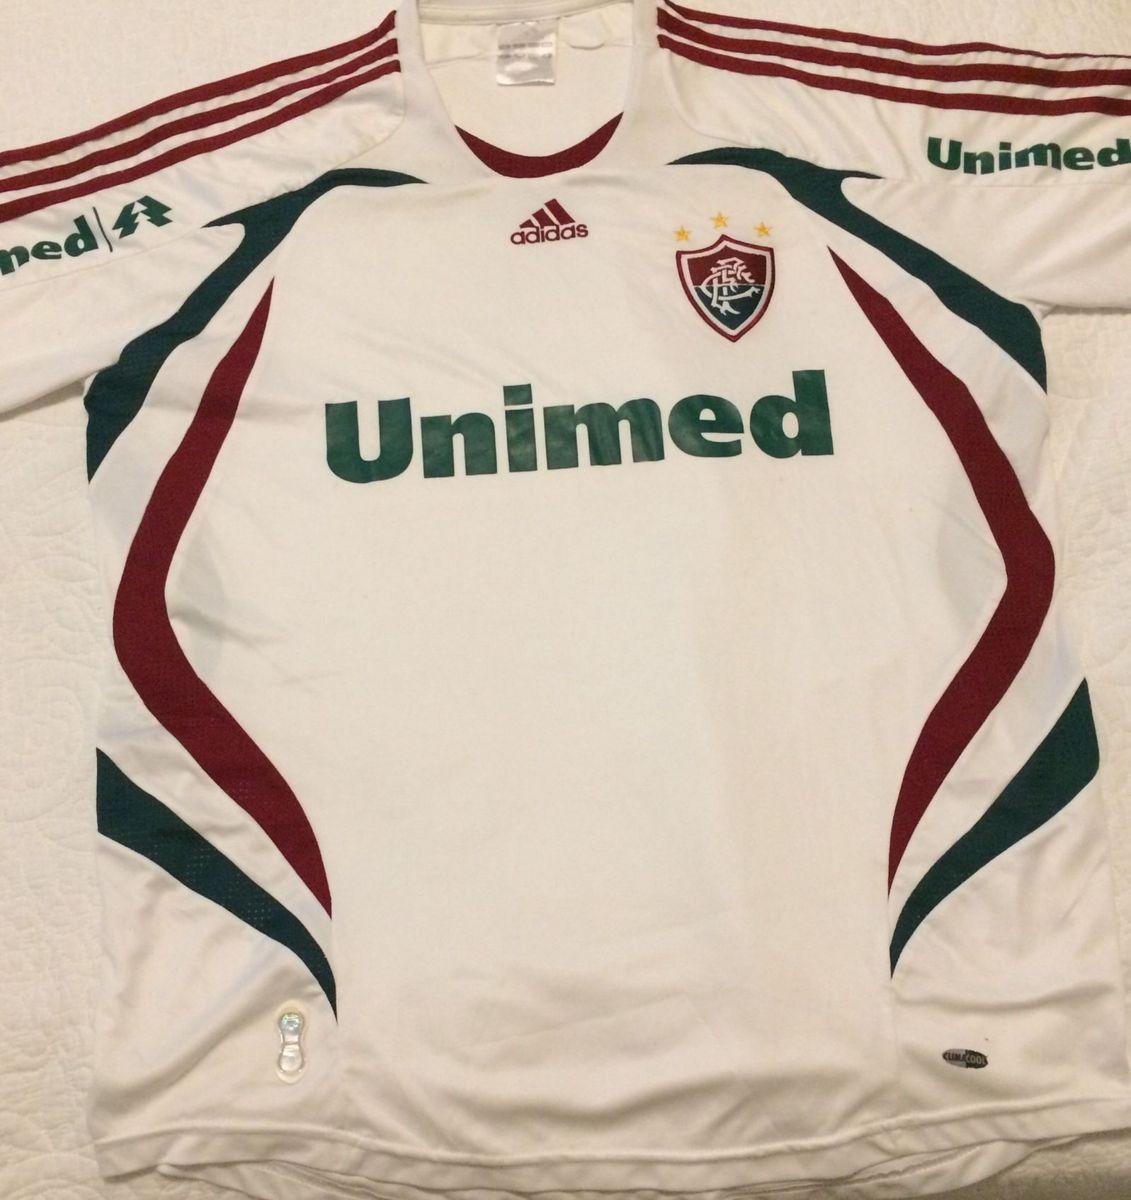 camisa fluminense - esportes adidas.  Czm6ly9wag90b3muzw5qb2vplmnvbs5ici9wcm9kdwn0cy82mzkzndi2l2rlnwzhmdjmzgniyjdhnze5owvjnjk2ytqyngq3ytvhlmpwzw  ... 81c5ca894b02b